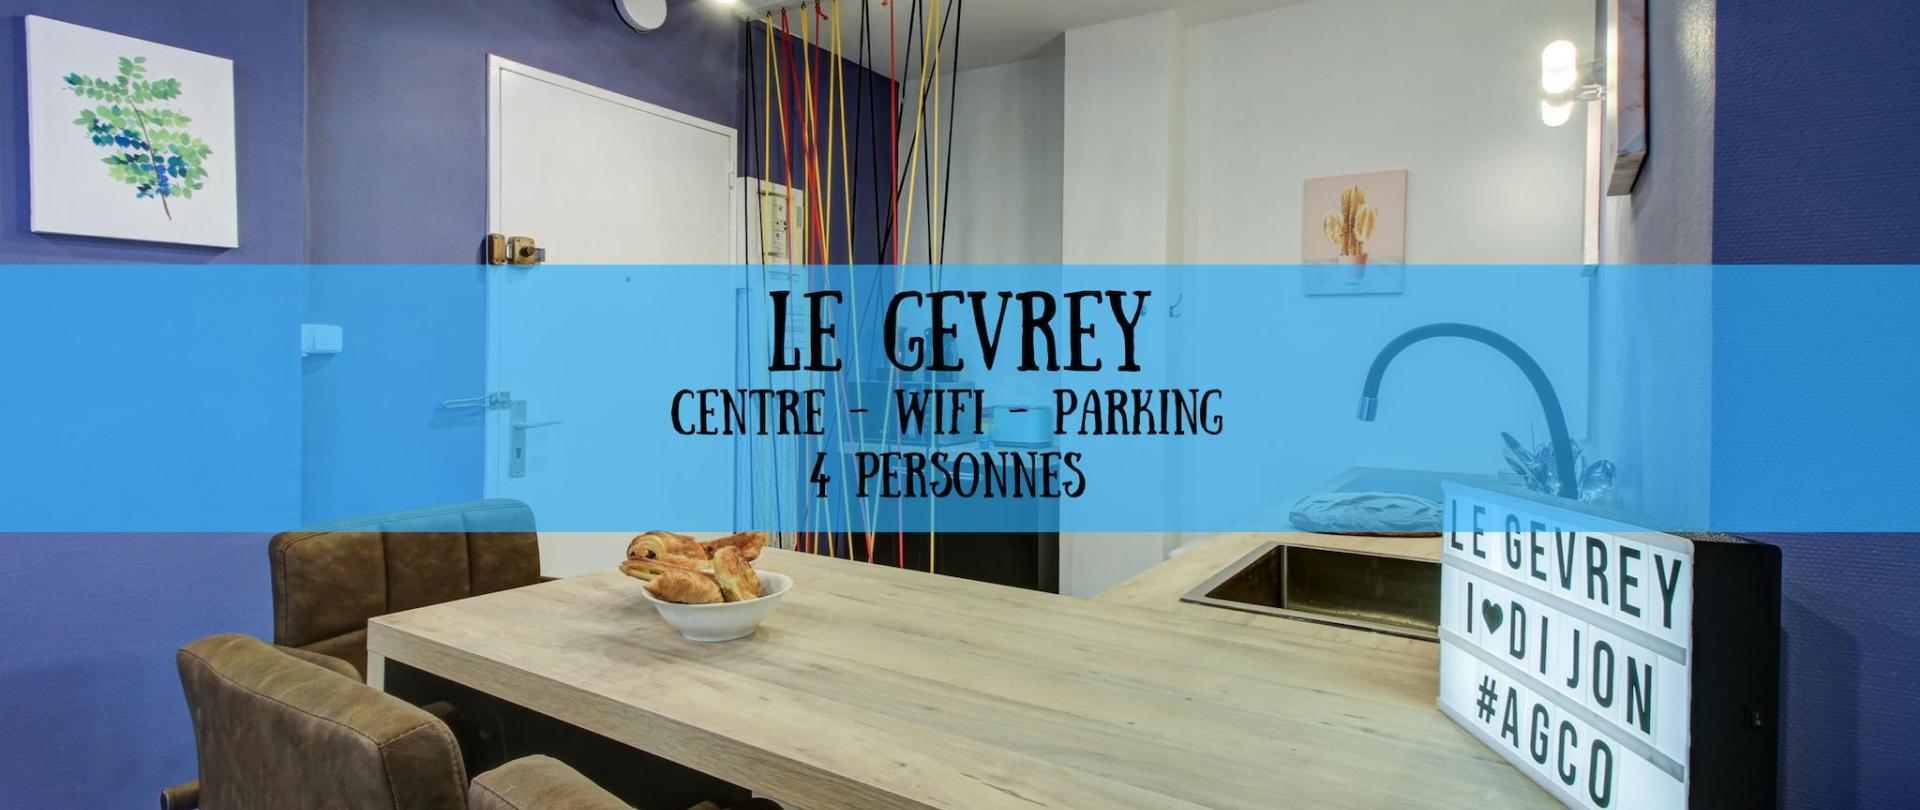 LE GEVREY DIJON-TOURISME